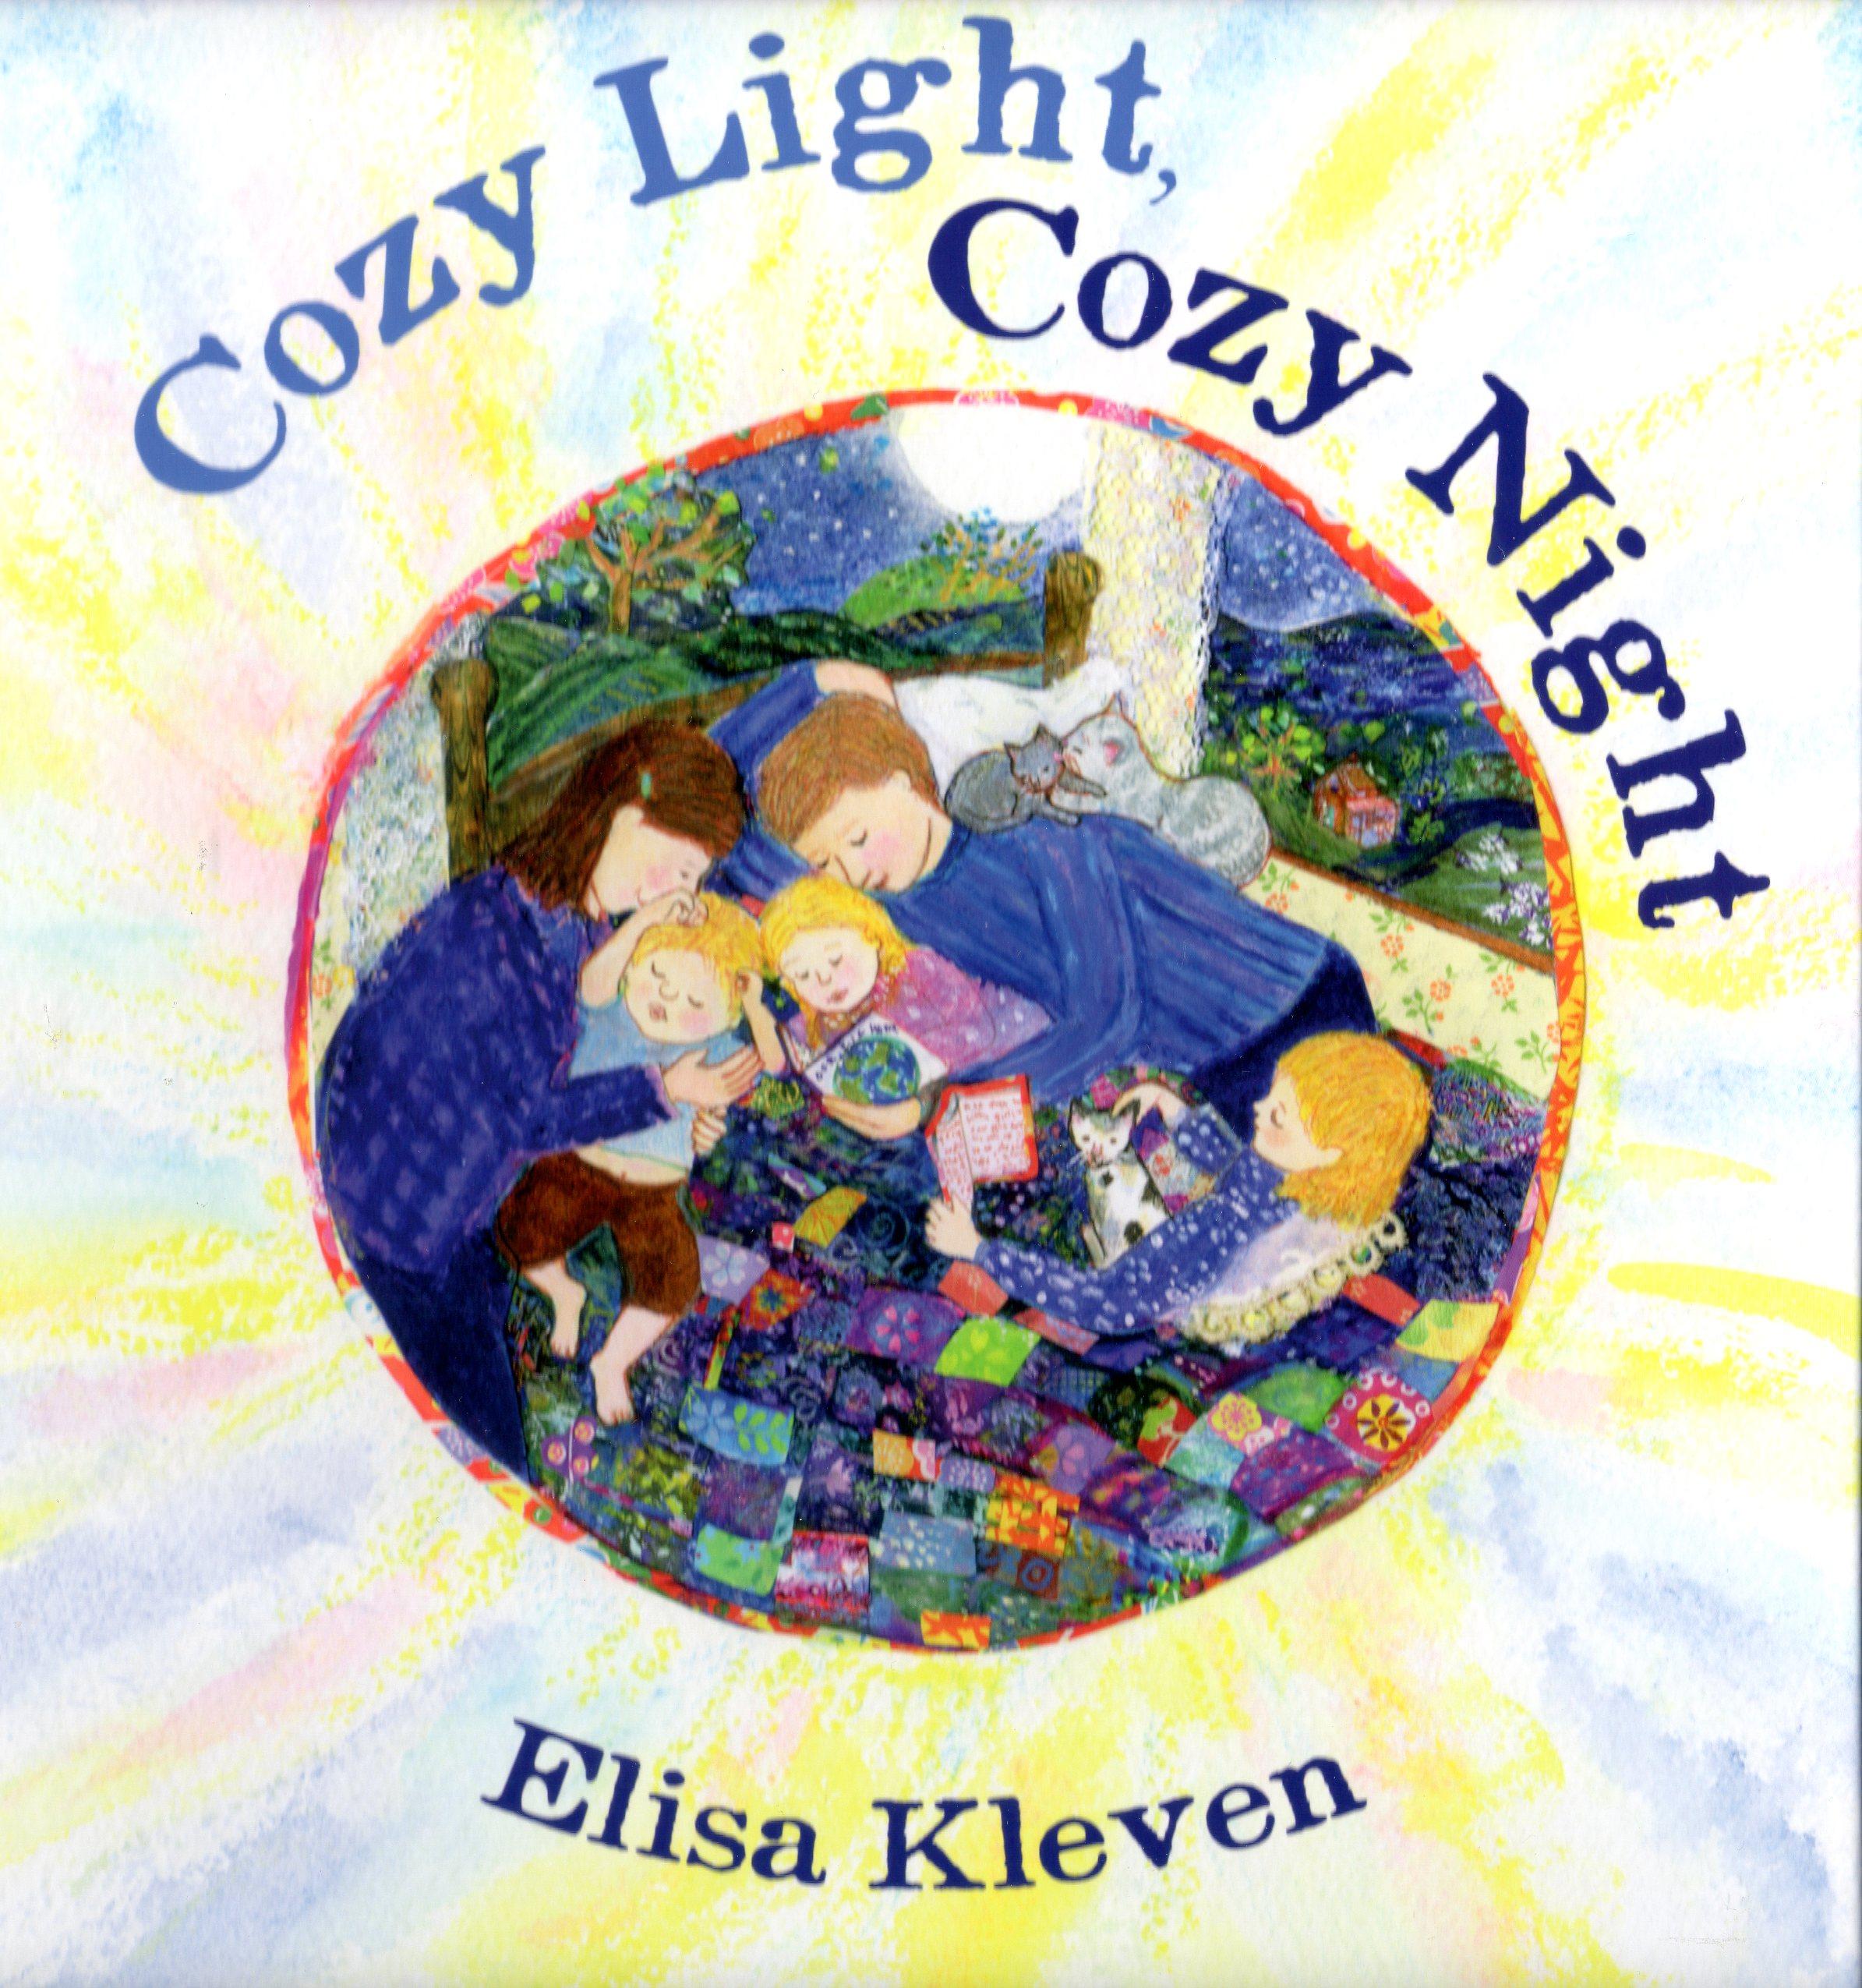 Cozy Light Cozy Night